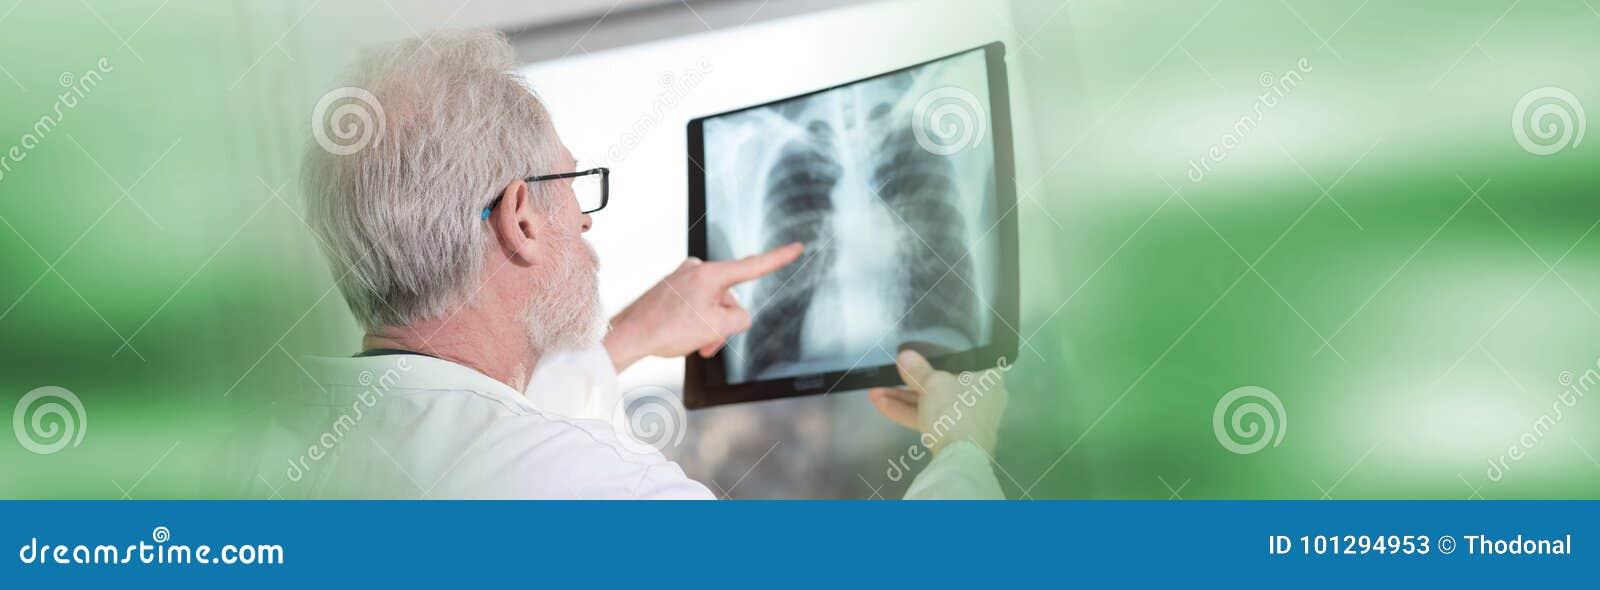 Arts die röntgenstraal bekijkt